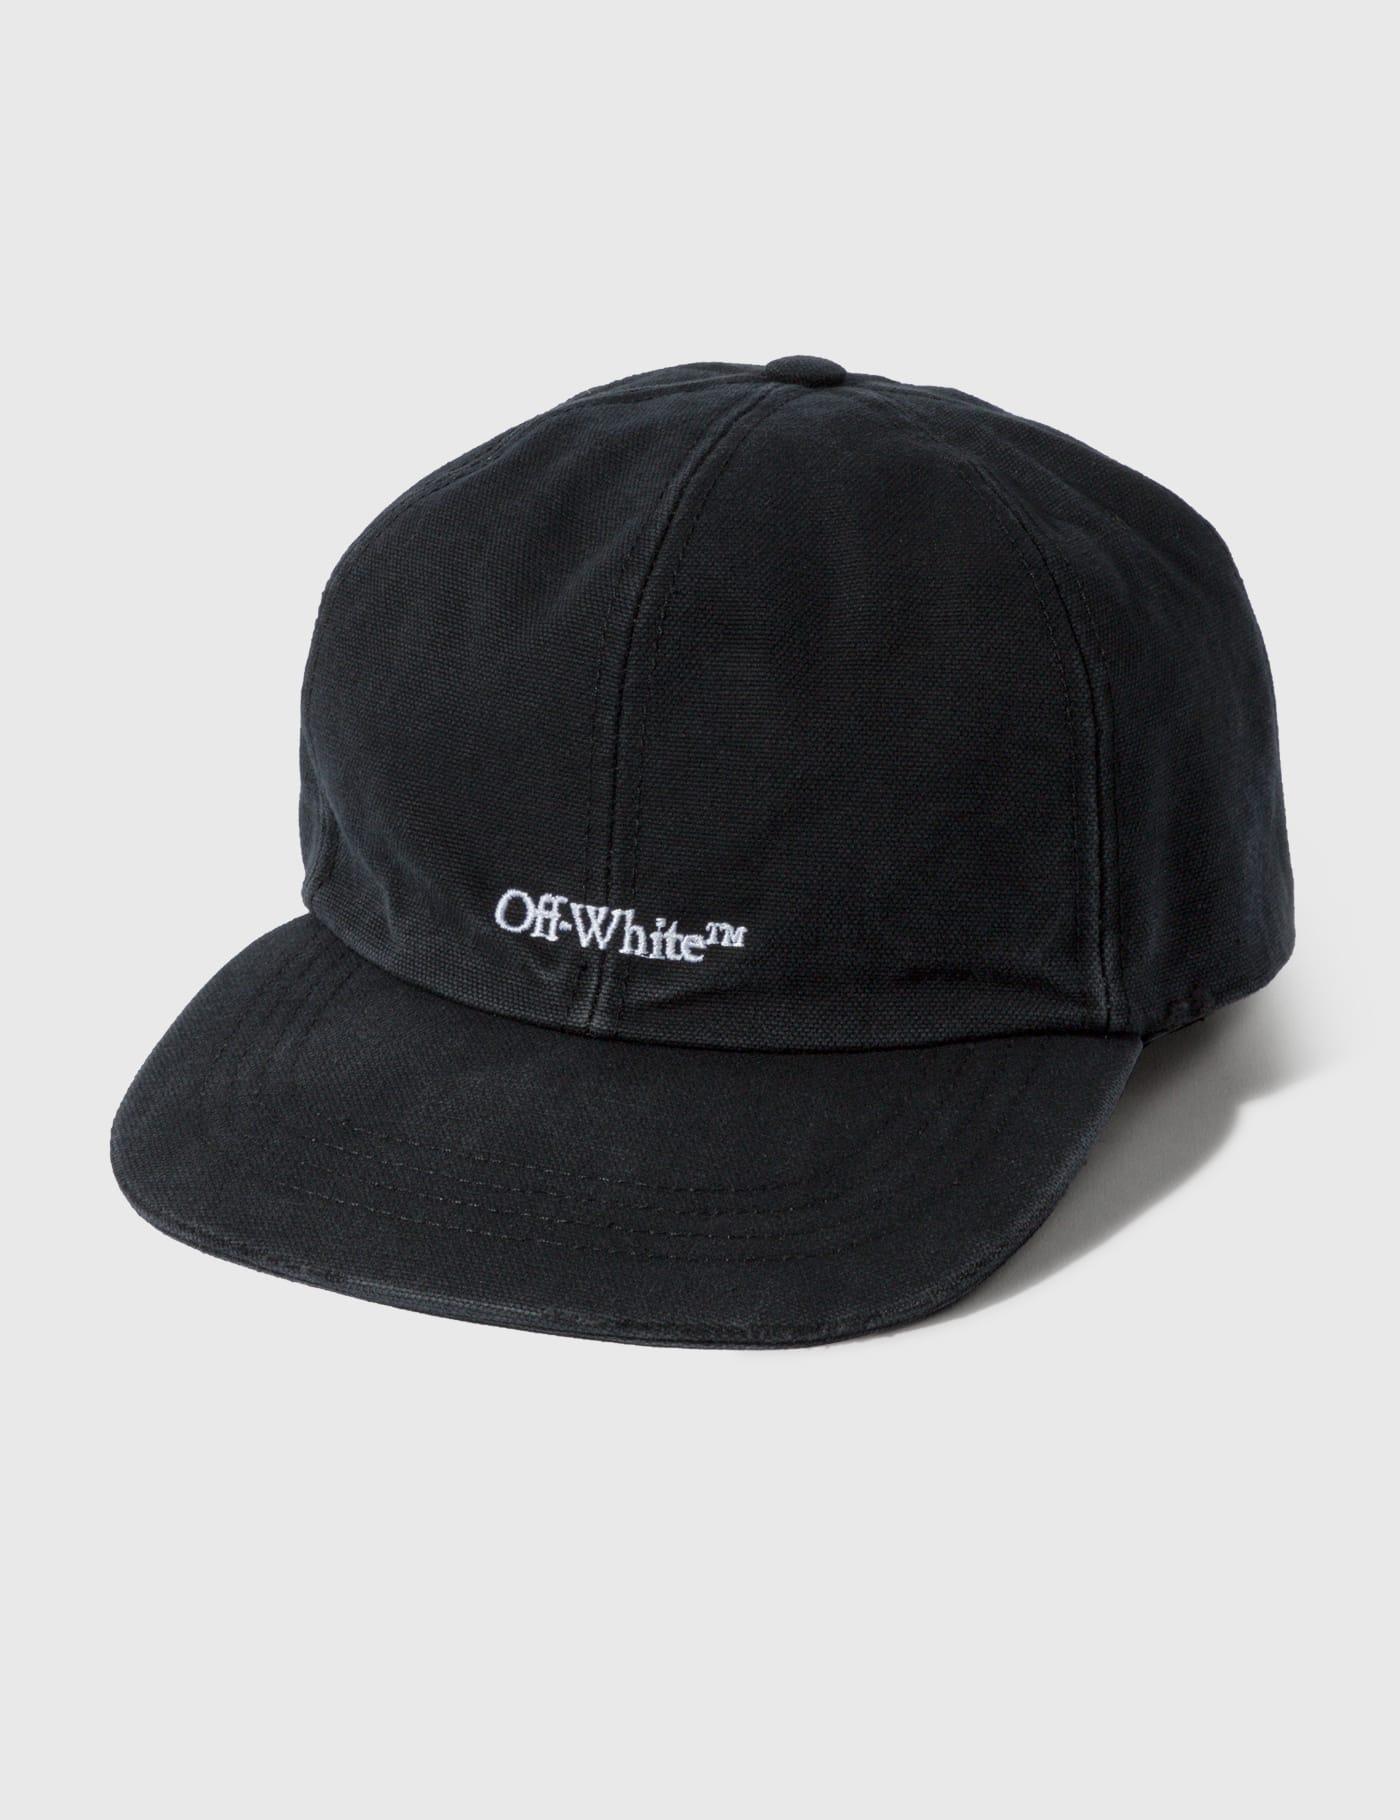 Bookish Off White Baseball Cap